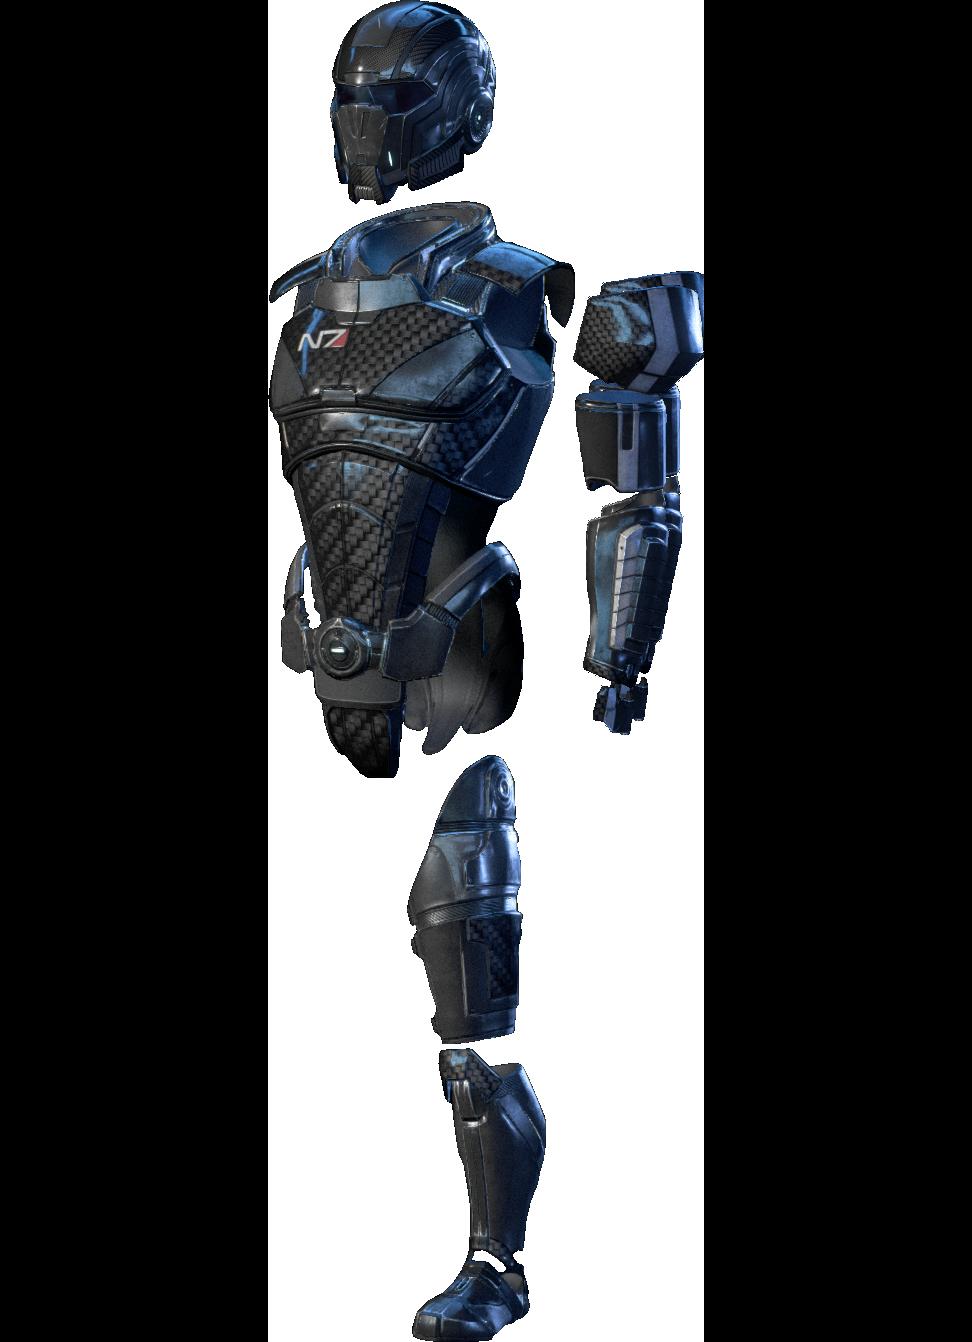 N7 Armor Mass Effect Andromeda Wiki